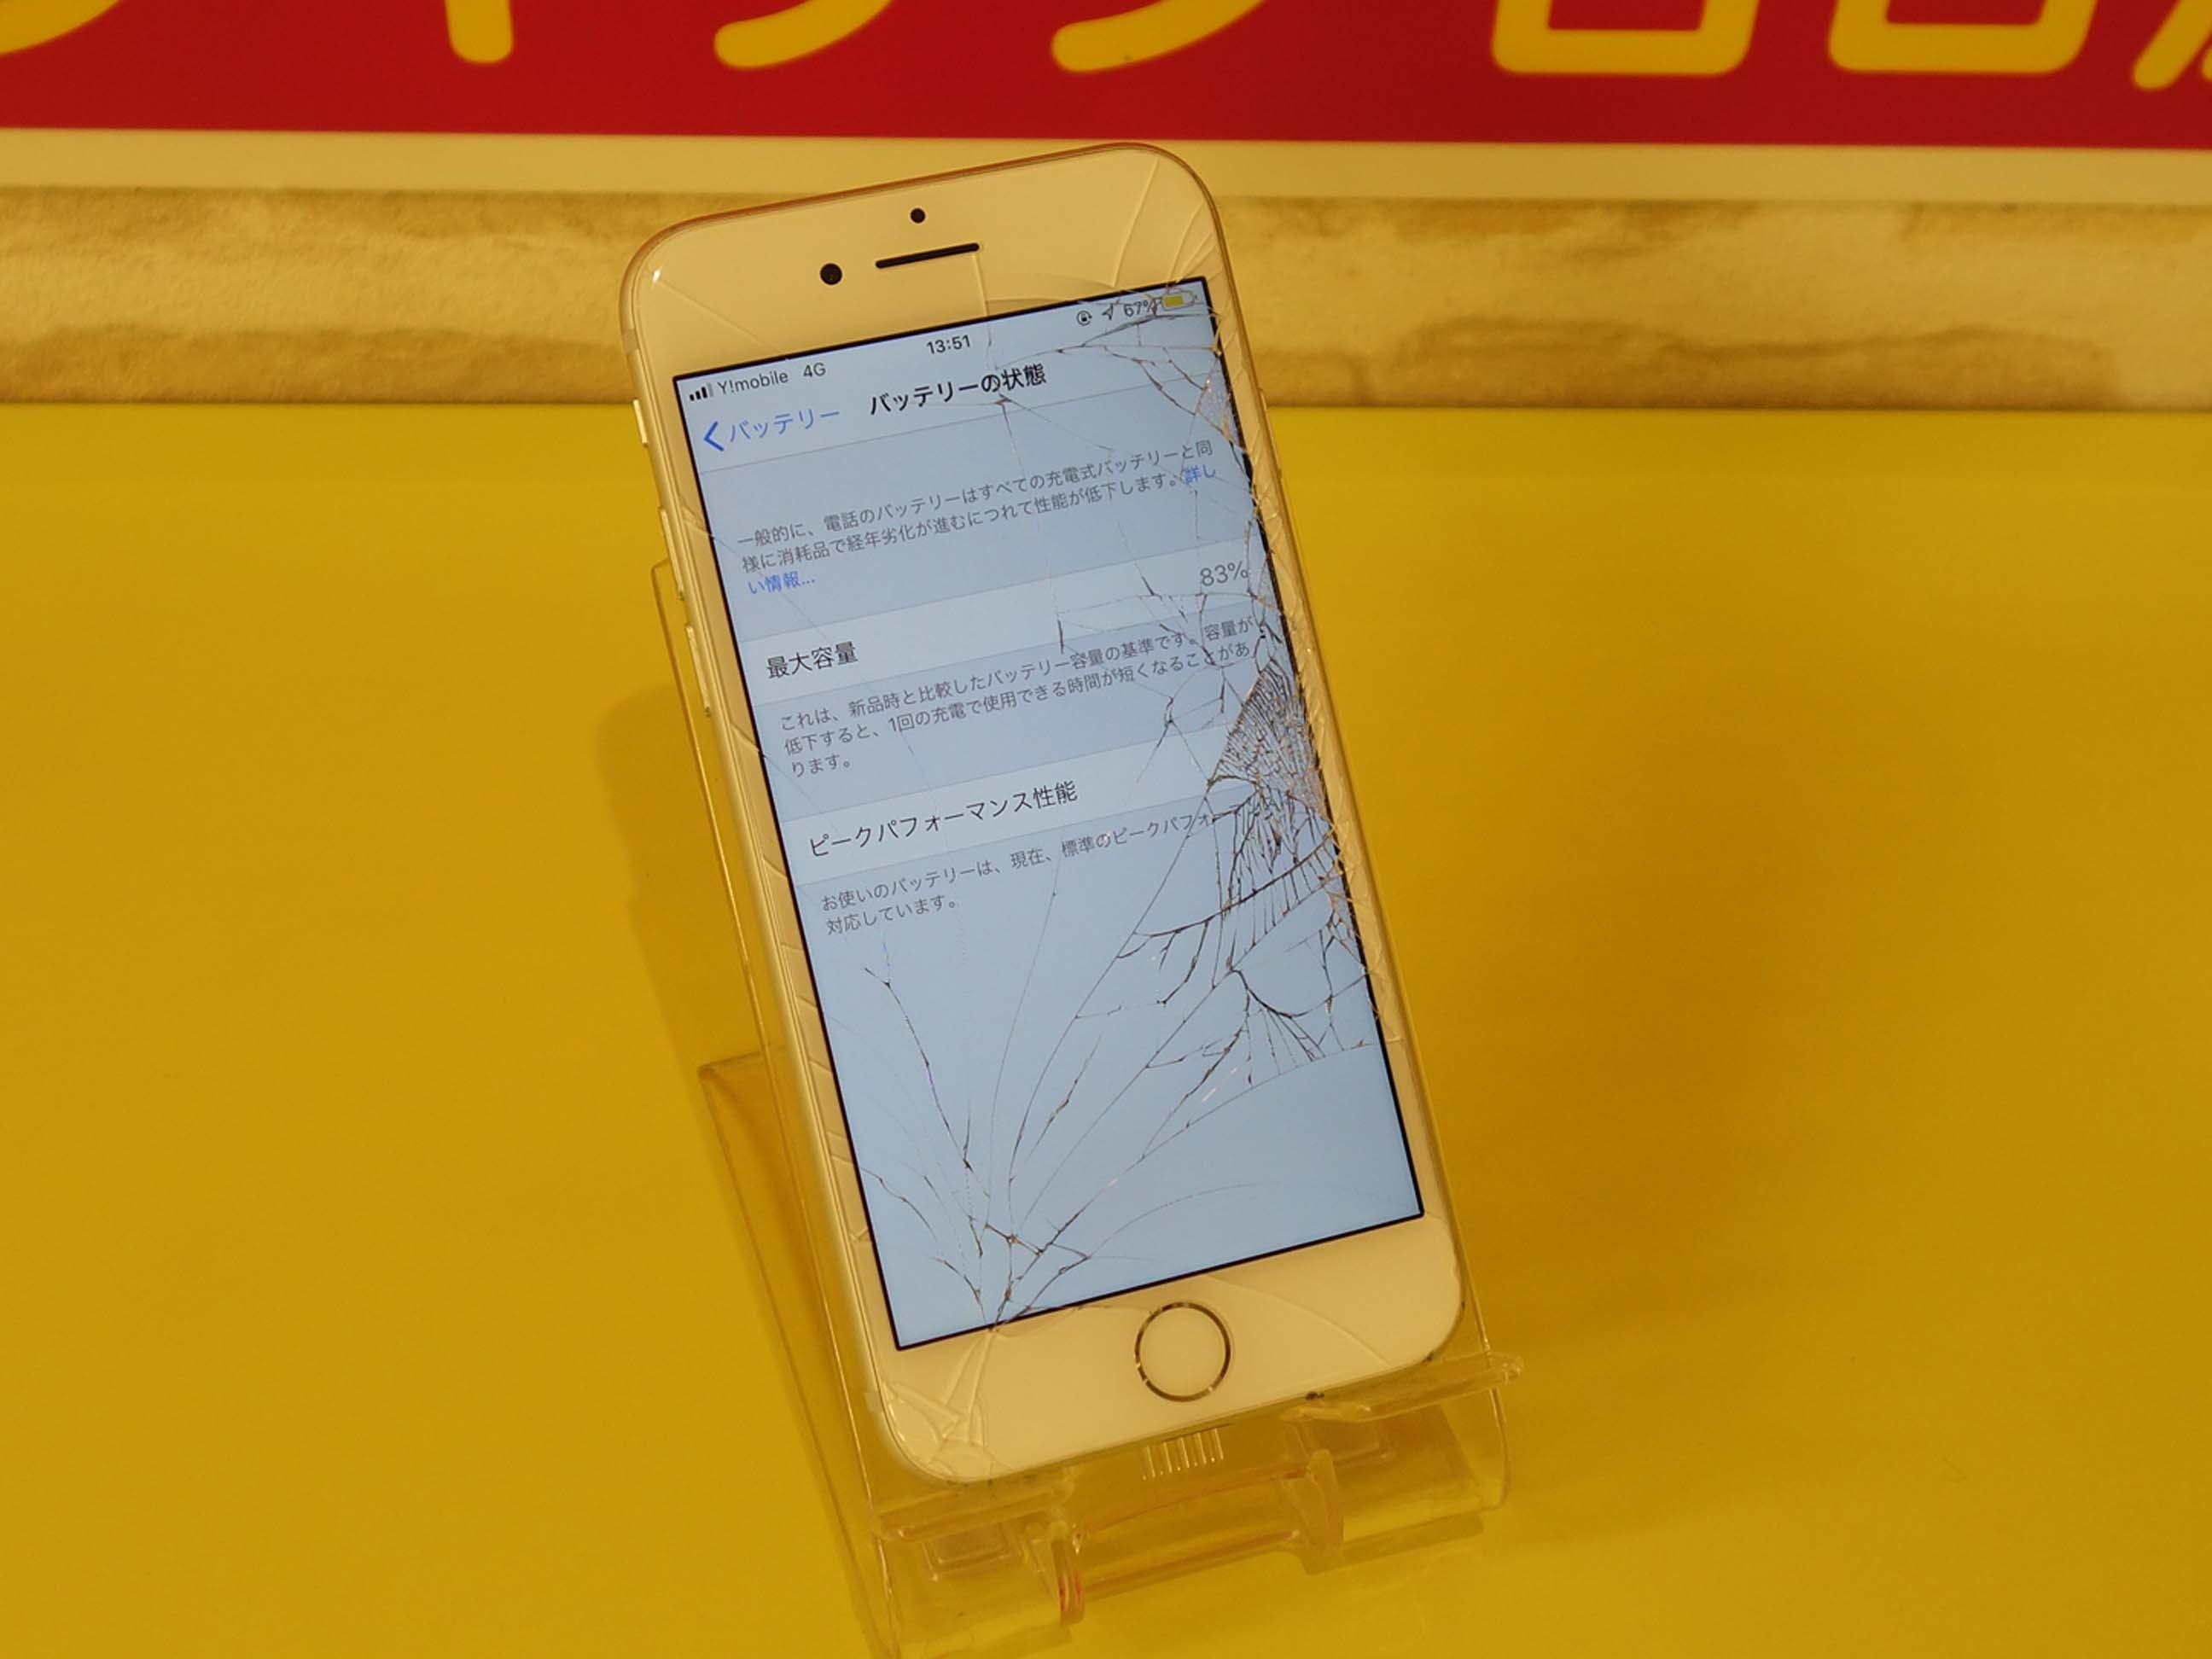 iPhone7のガラスとバッテリー交換修理で名古屋市内からご来店!アイフォン修理のクイック名古屋